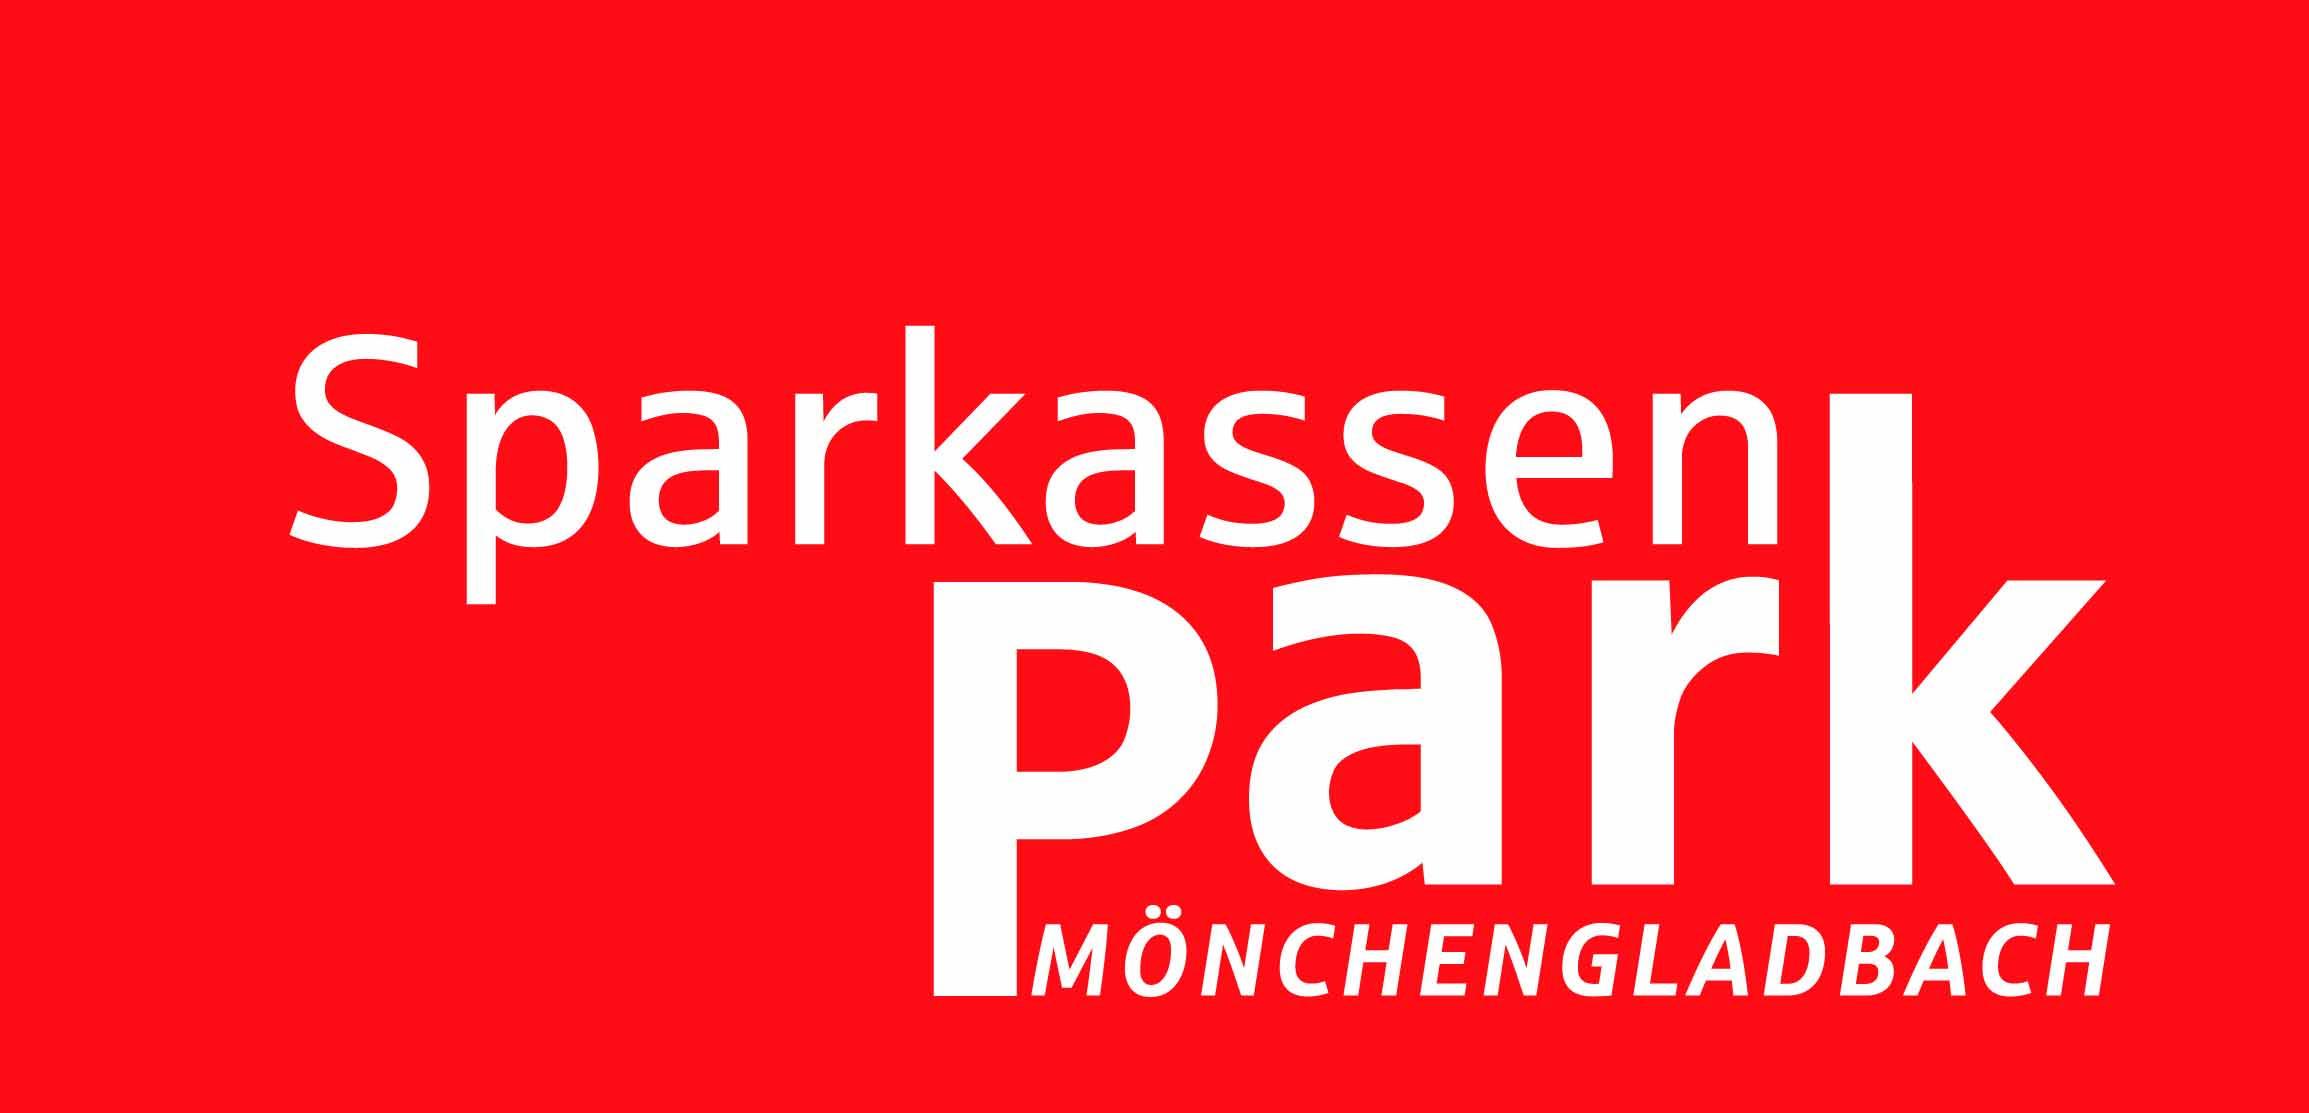 Sparkassenpark